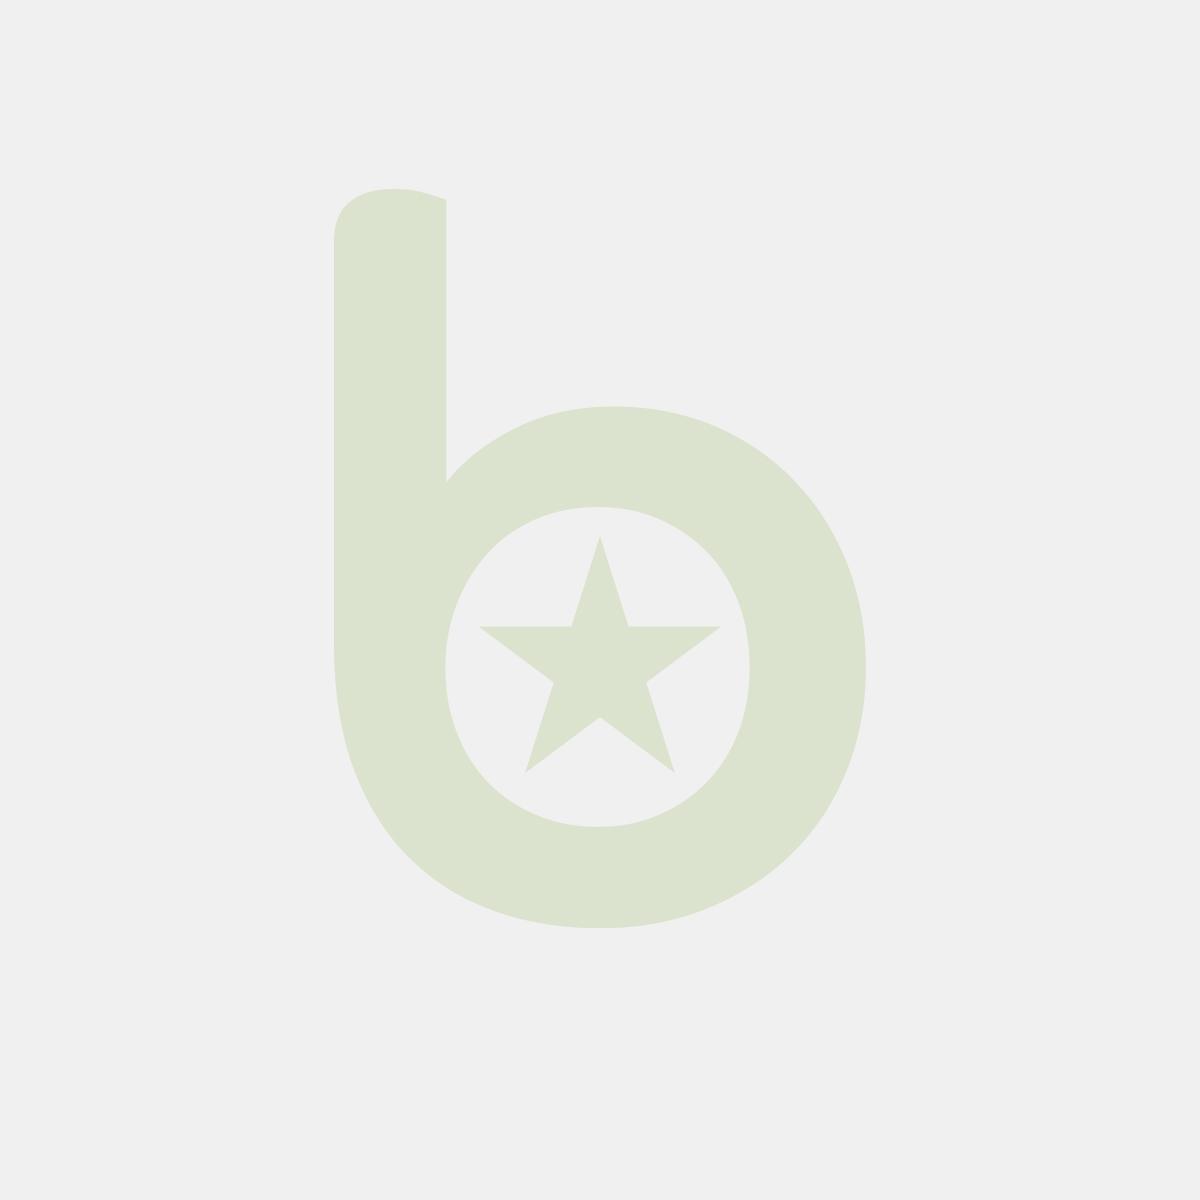 Obrus PAPSTAR Royal Collection 120x180 biały